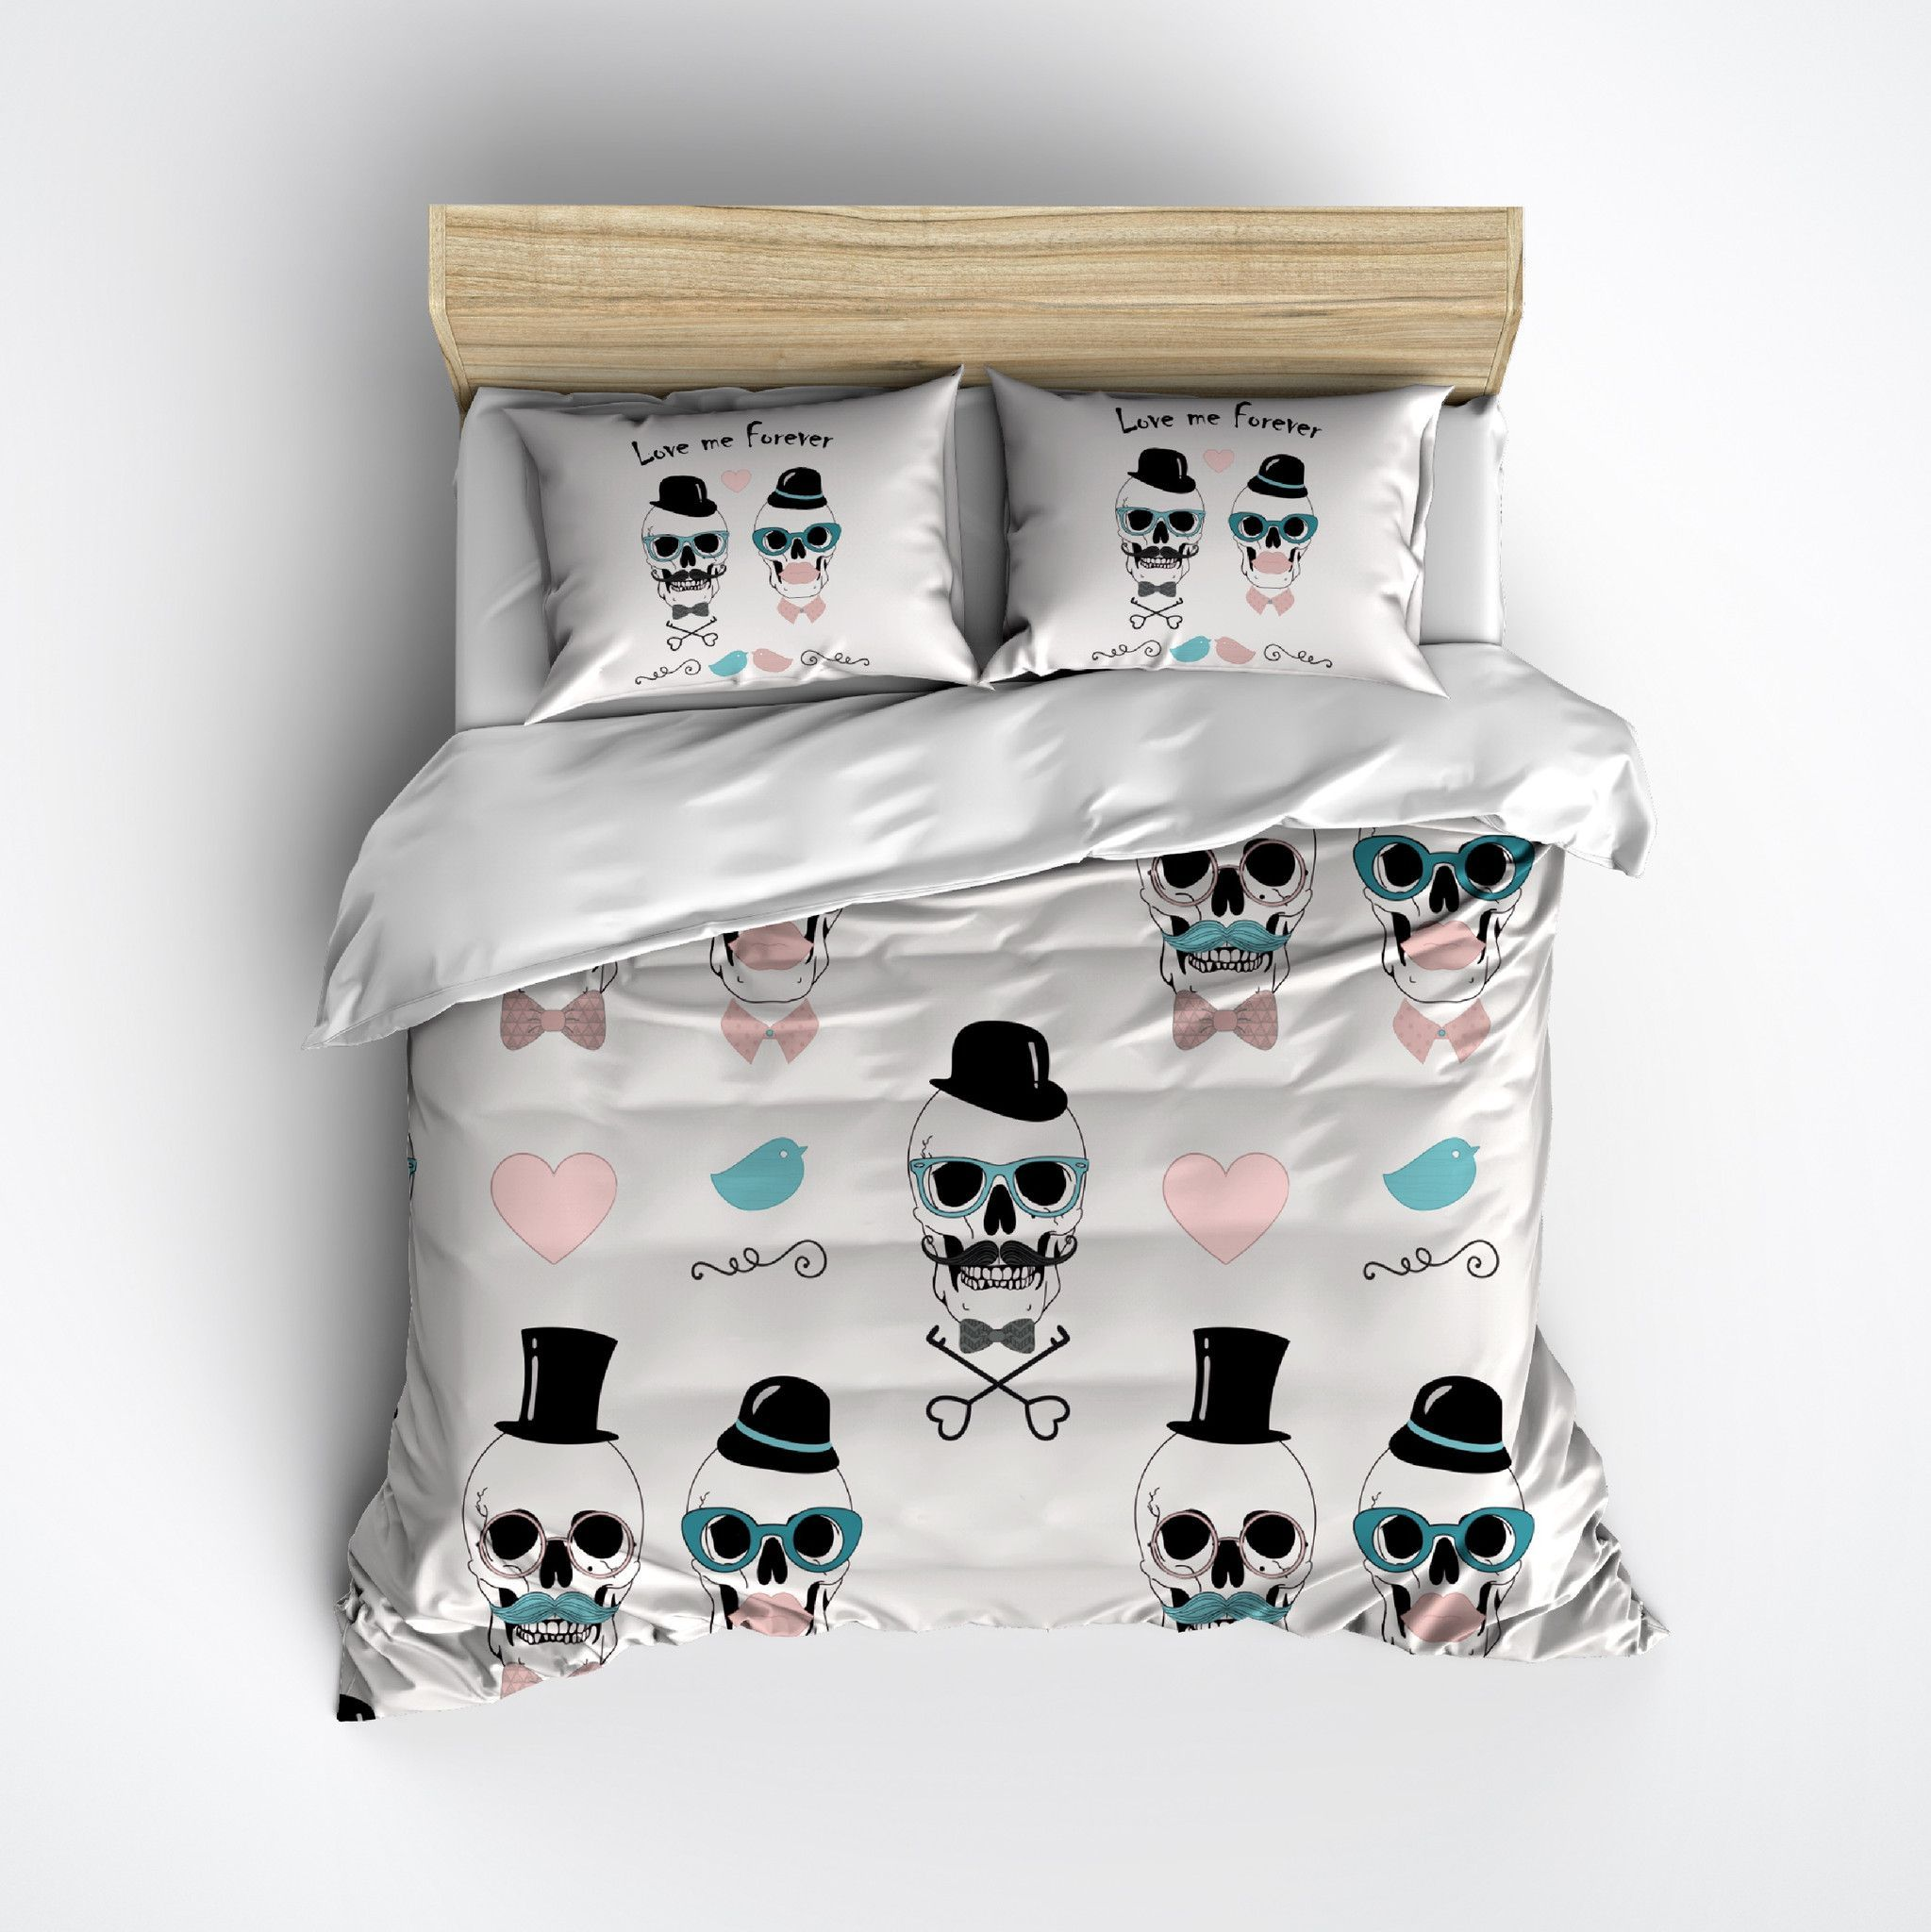 big beddingoutlet dreamcatcher hipster watercolor king bed set beautiful size queen of lots bedding